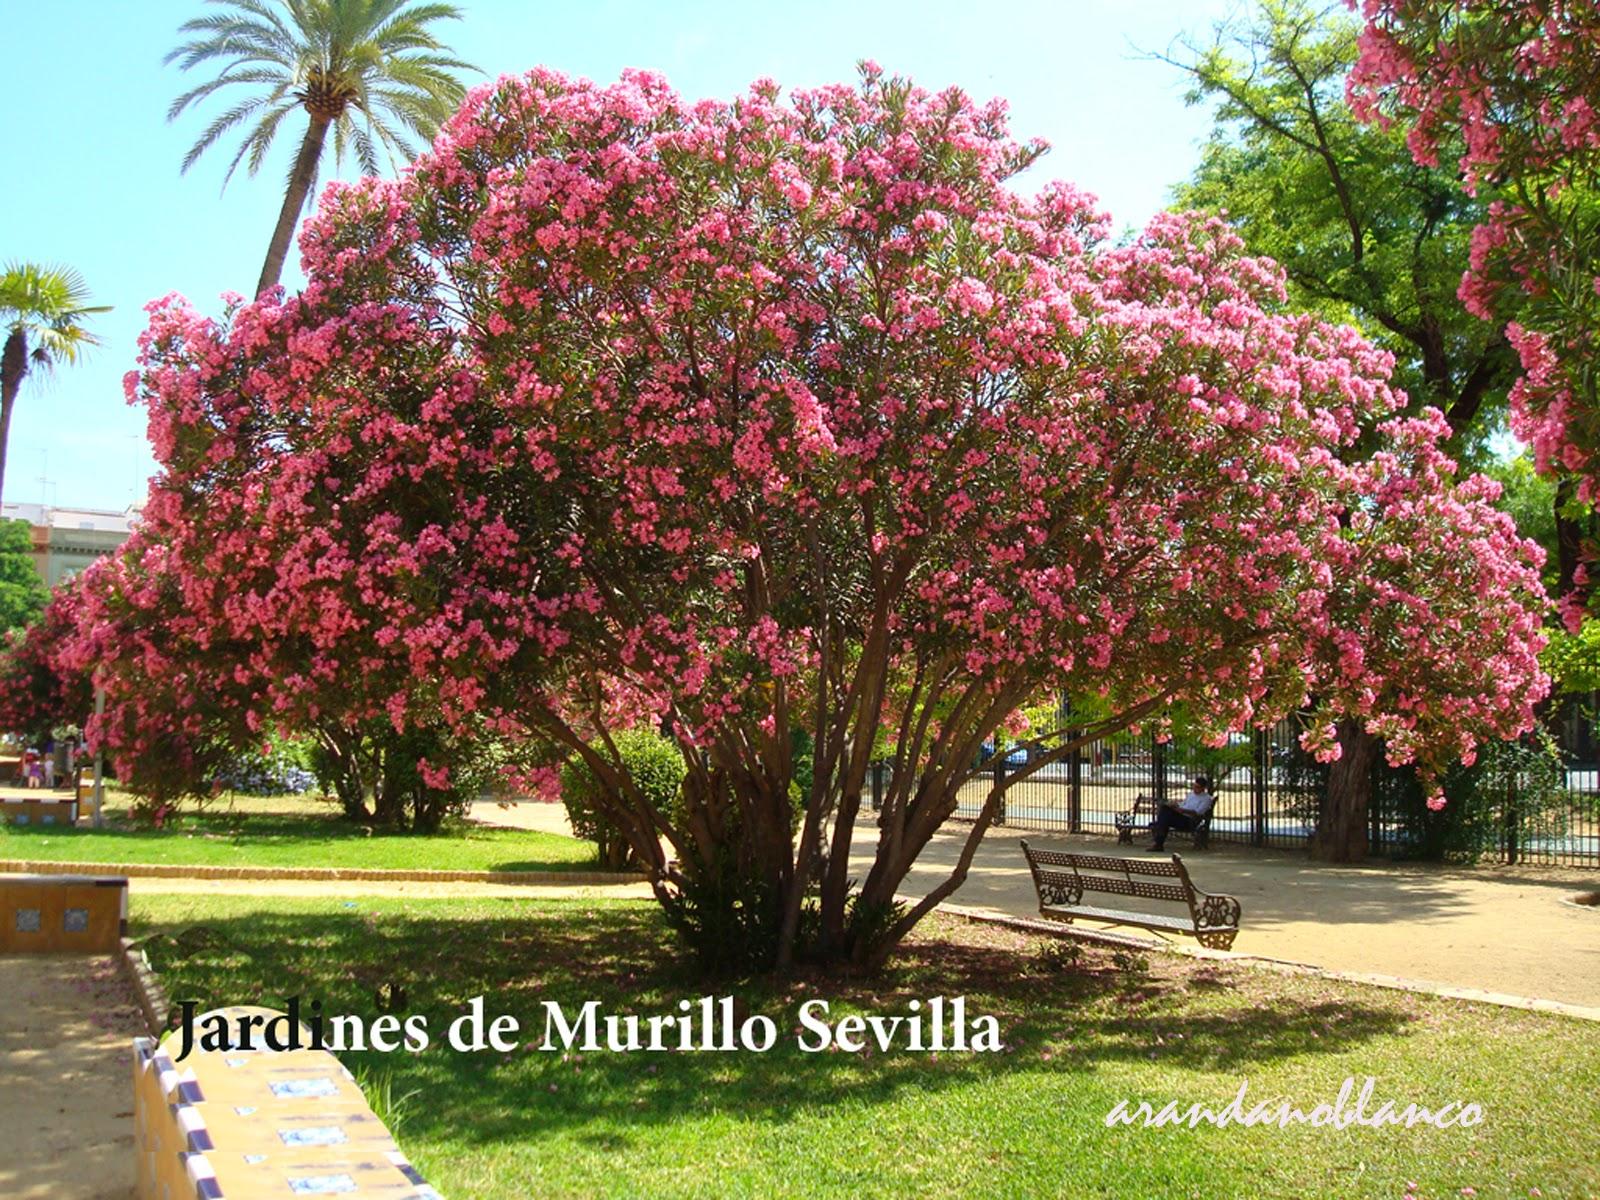 Arbustosensevilla encinarosa adelfa nerium oleander for Jardines de murillo